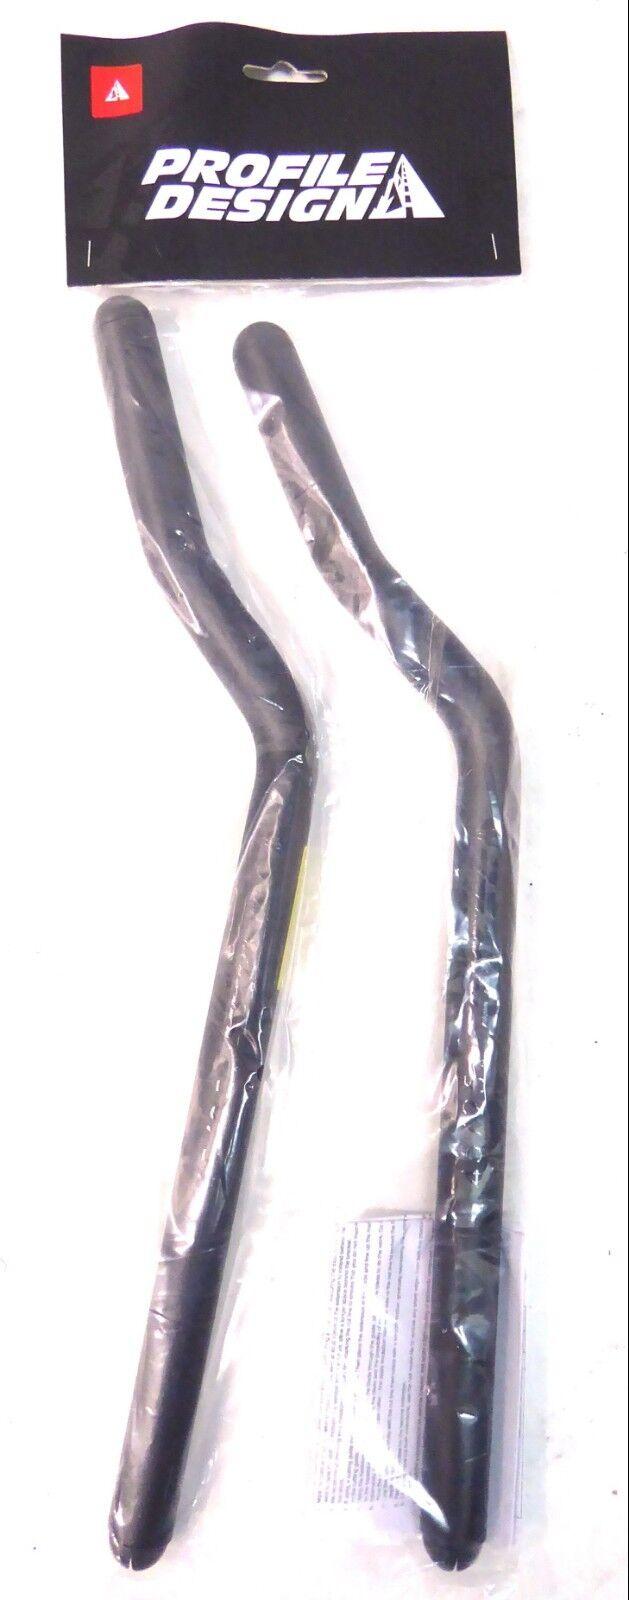 Profile Design 45 25a Aluminum Extensions